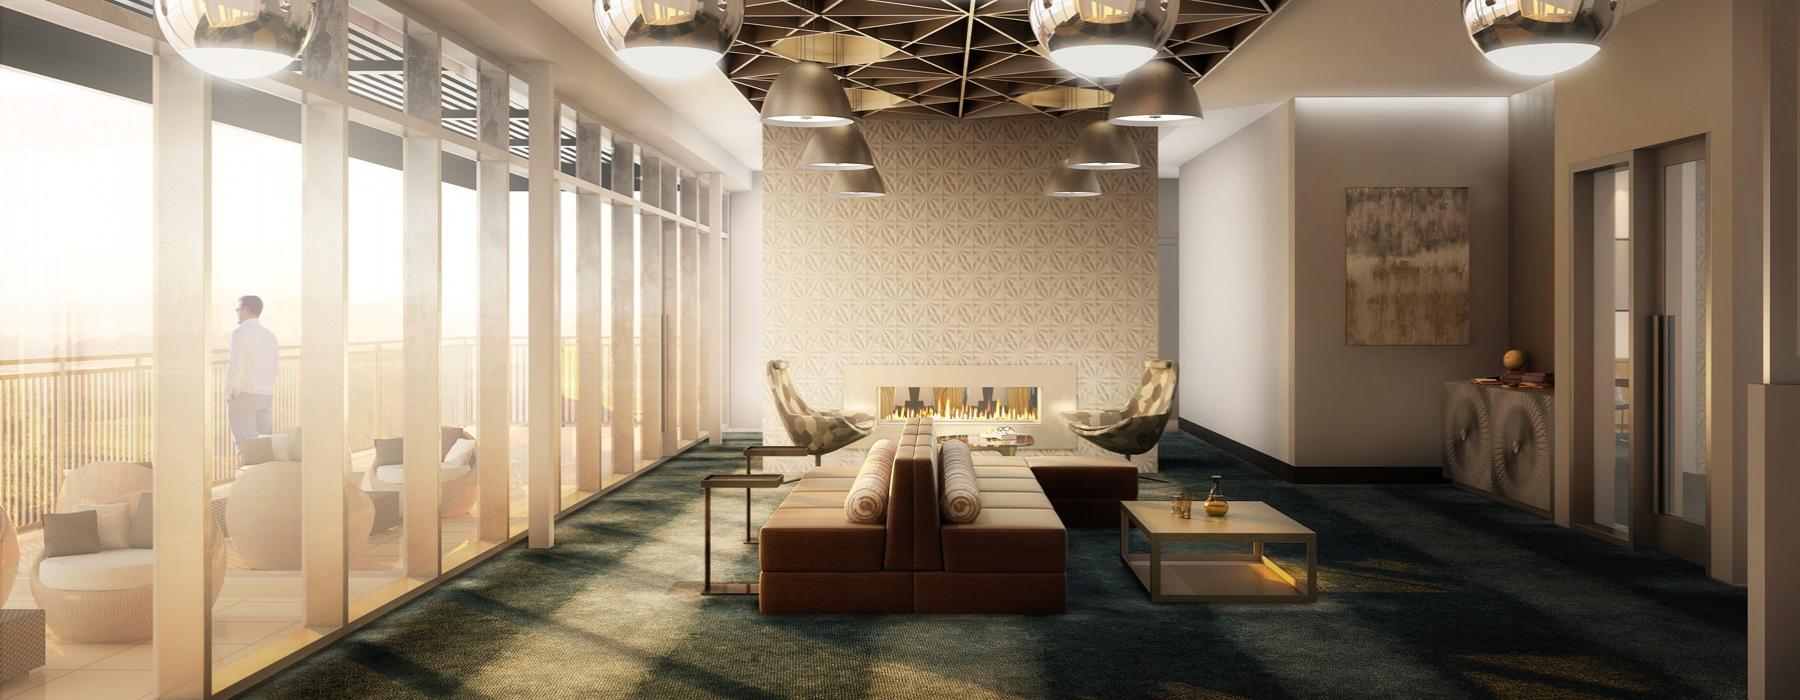 Well-Lit, Open-Concept Clubroom